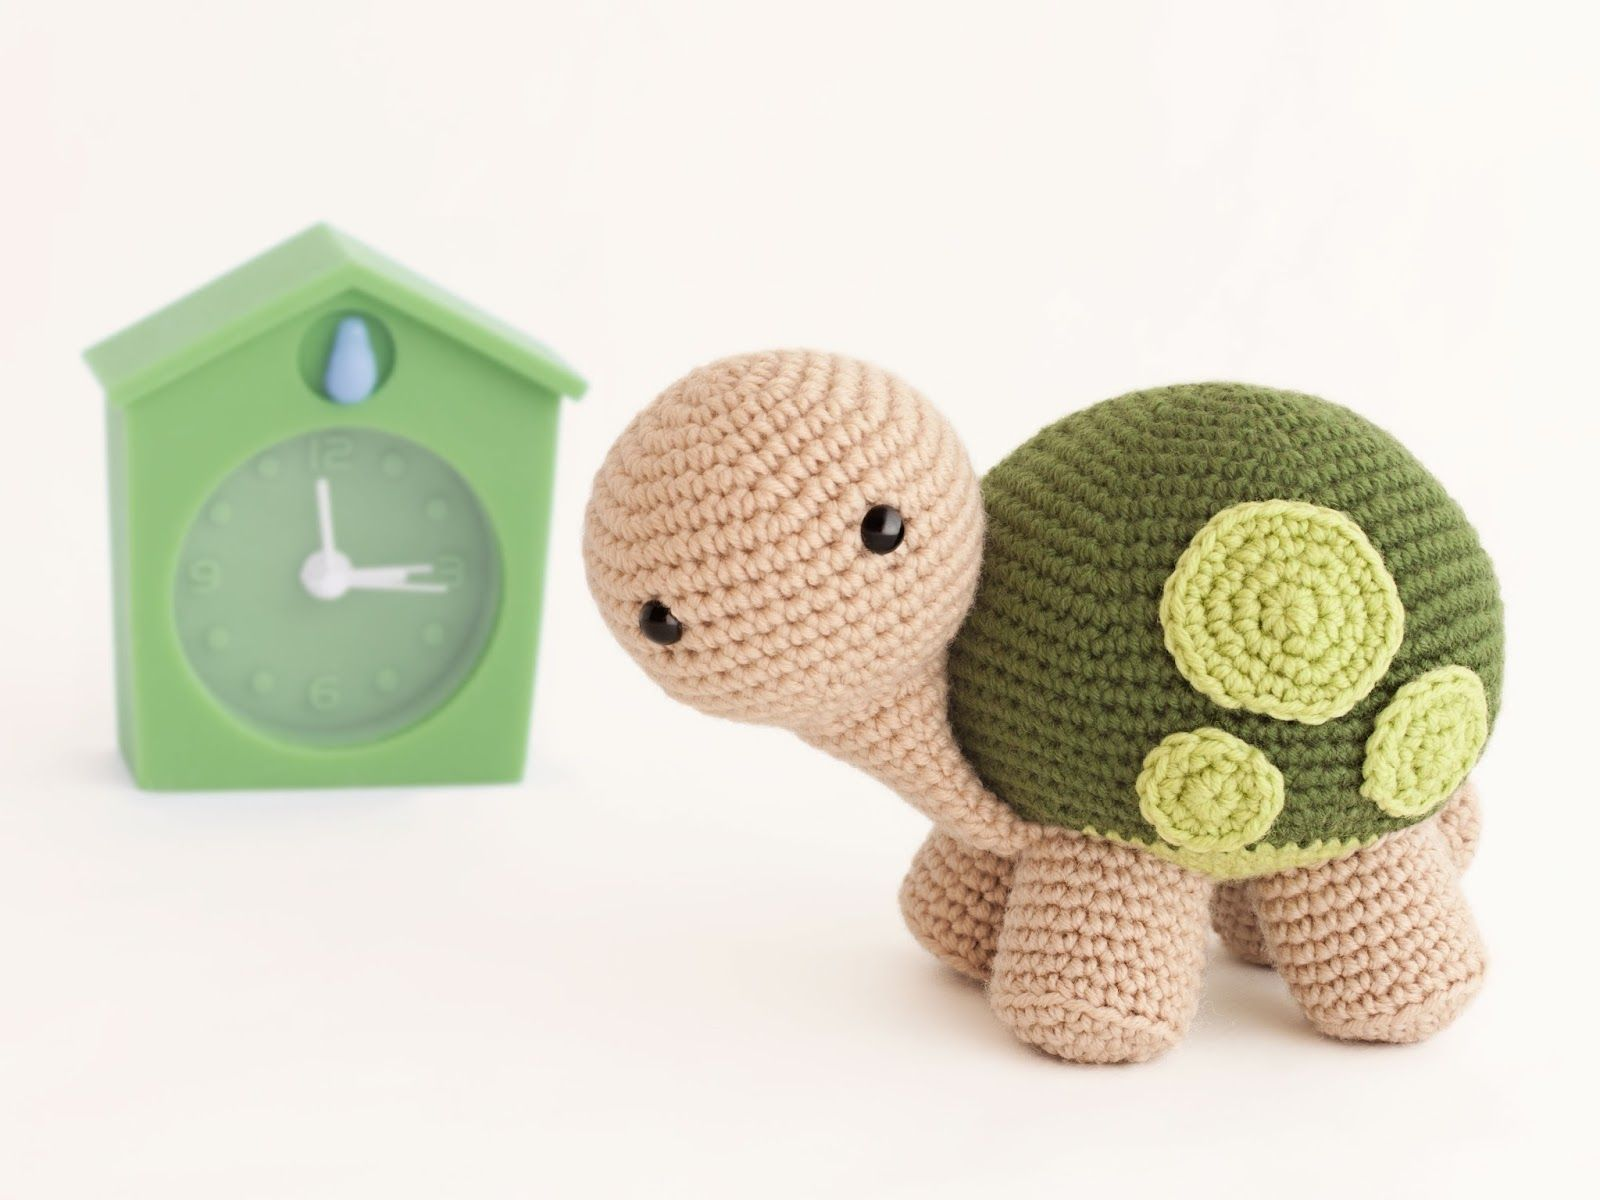 Amigurumi Turtle : Amigurumi turtle free crochet pattern tutorial crochet